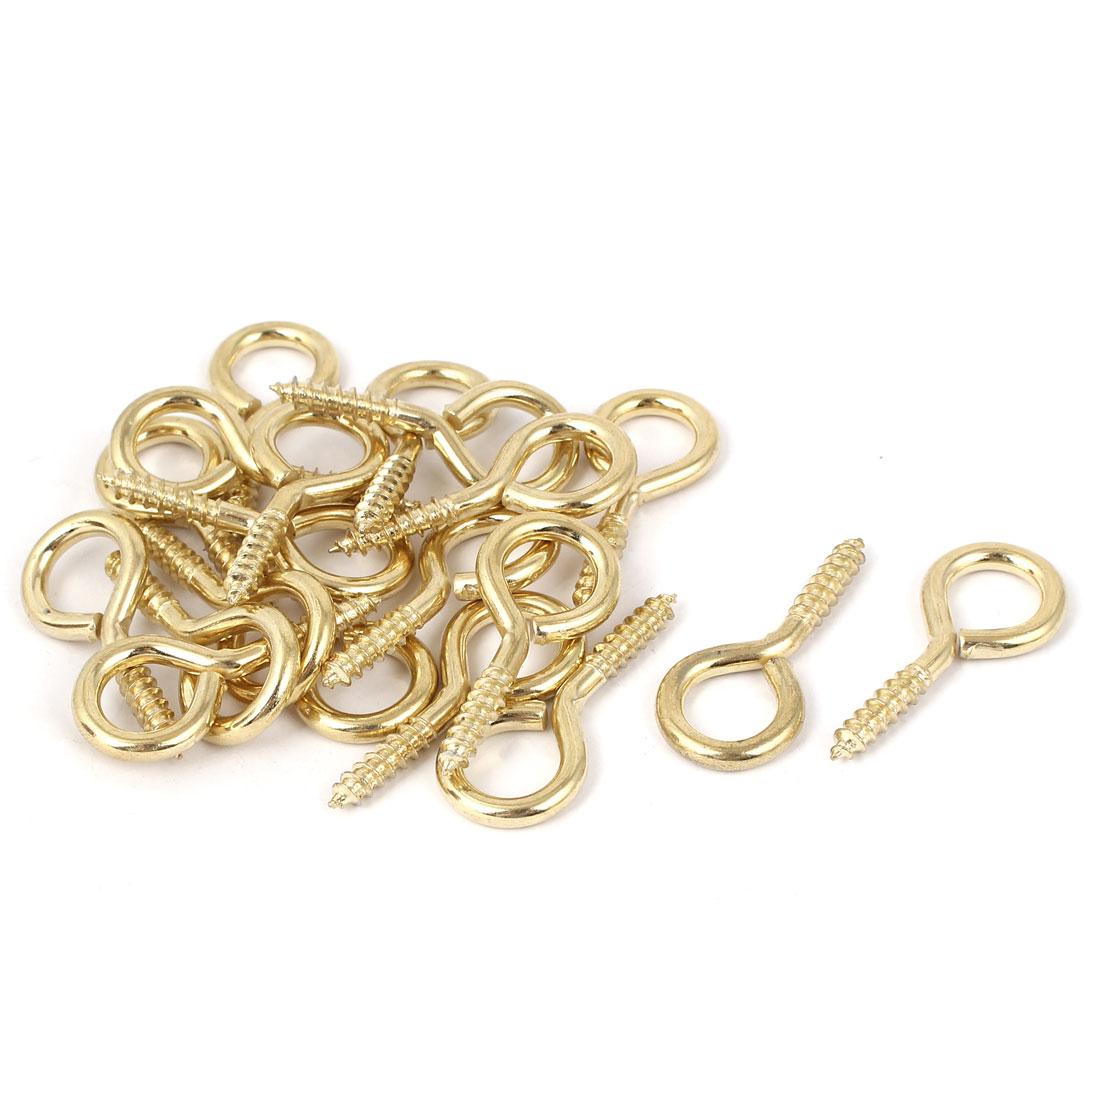 Jewelry Garden Vine Wire 4.8mm Thread Dia Eyelet Screw Eye Hook Gold Tone 20pcs